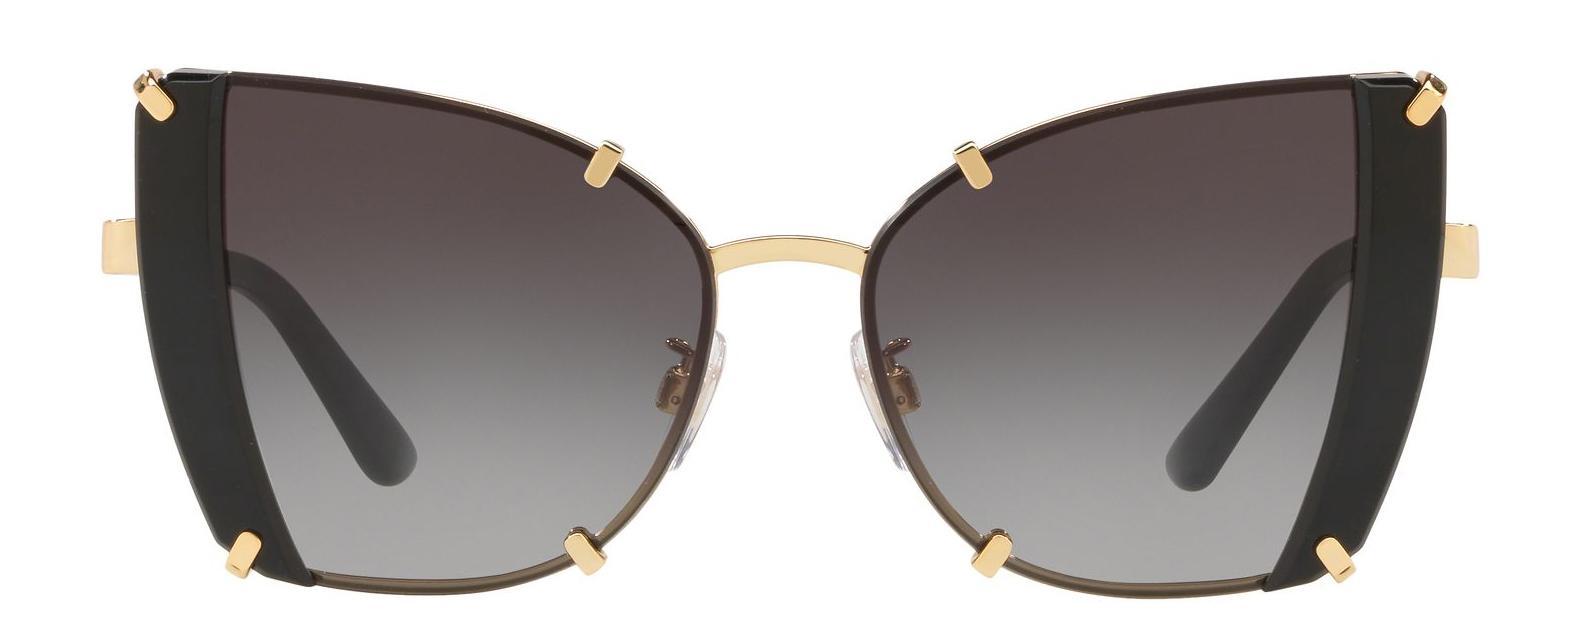 0b090bd8e1c Lyst - Dolce   Gabbana 2214 Butterfly Sunglasses in Brown